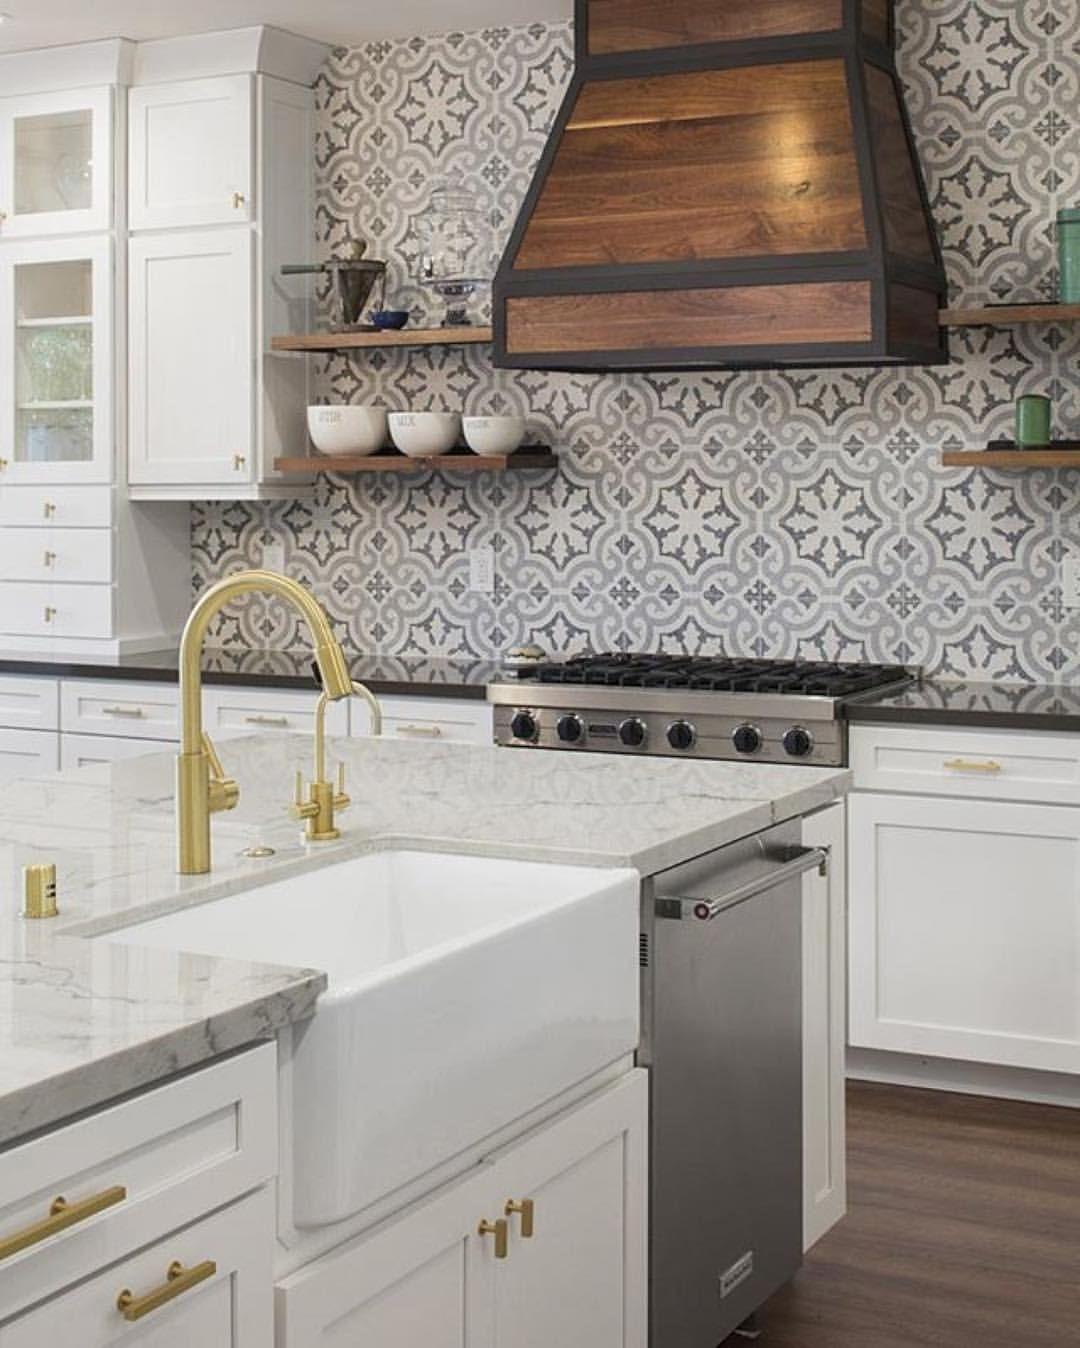 Pin by lauren shields on home in pinterest kitchen